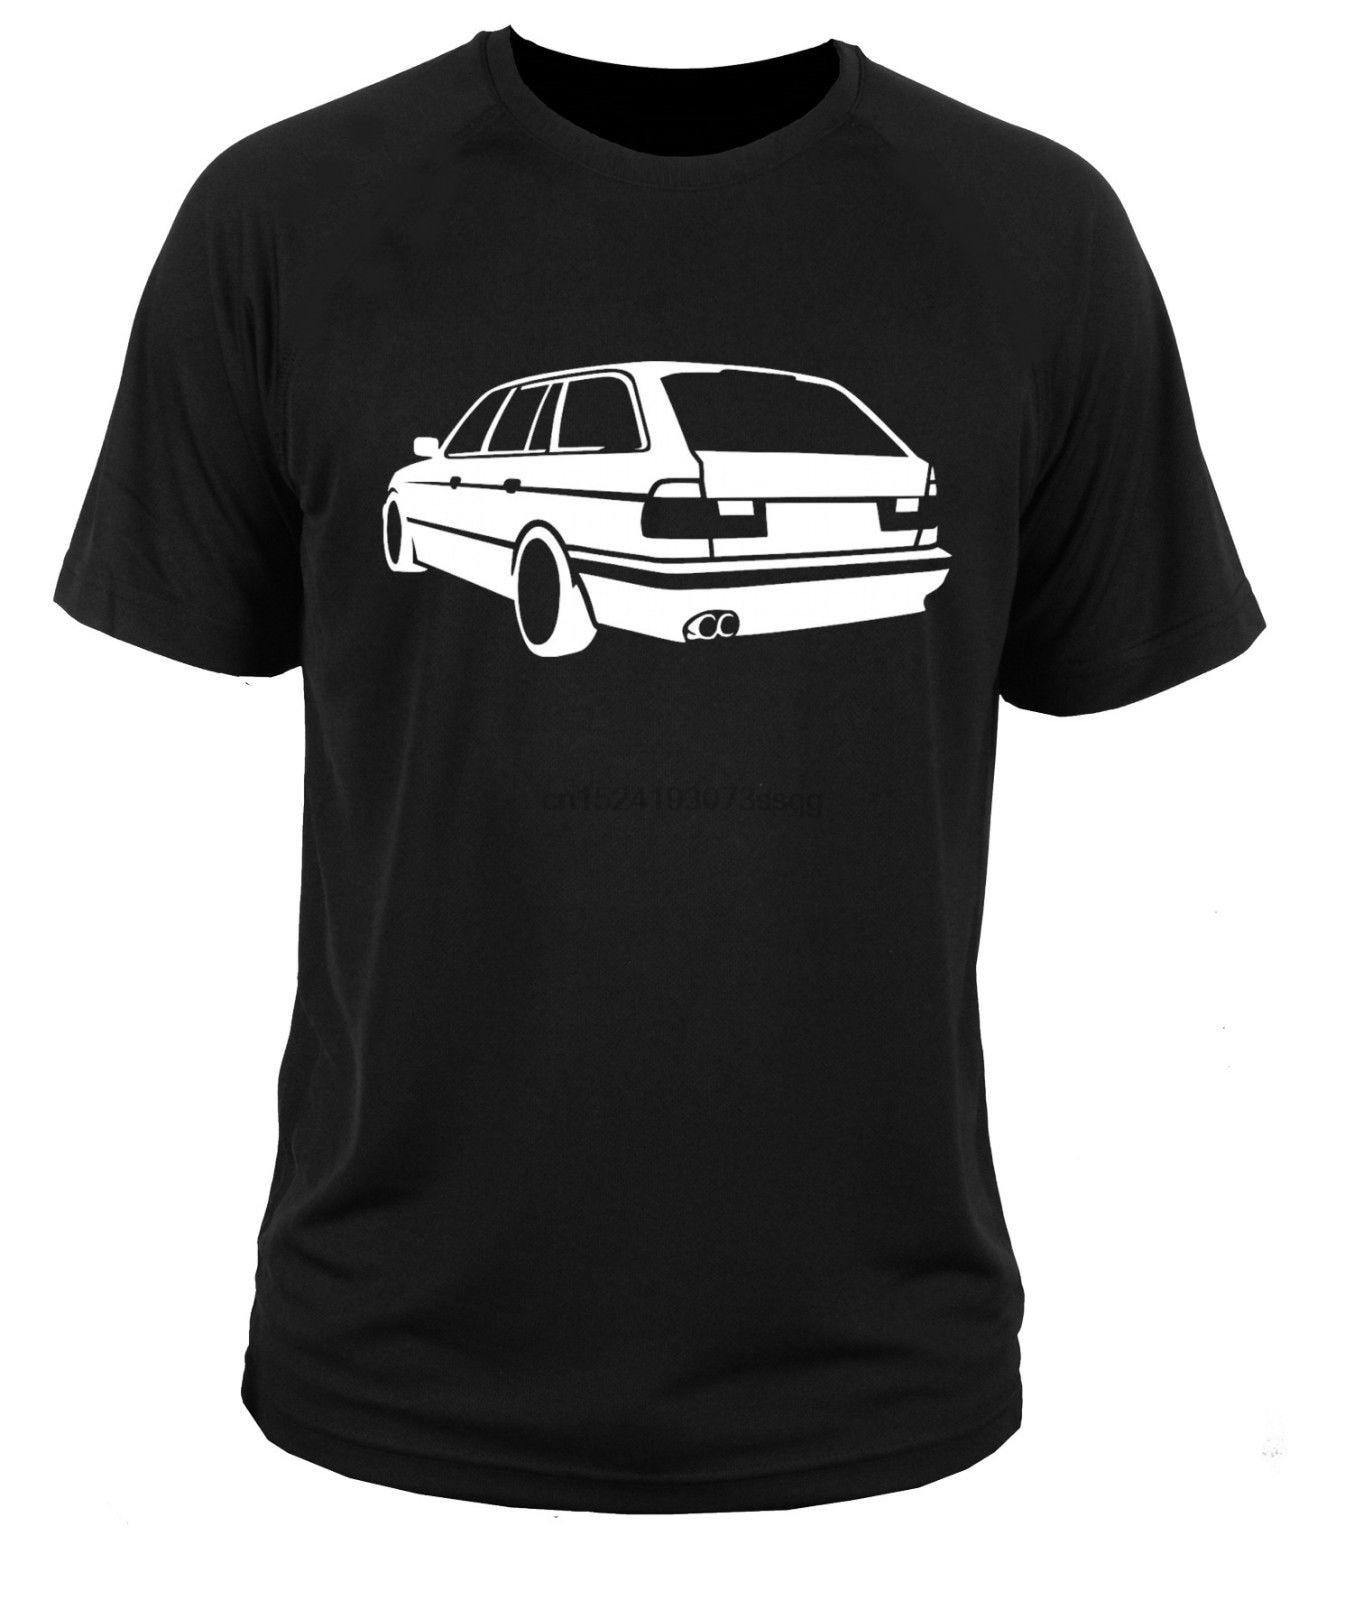 Camiseta de manga corta 2019 de algodón para hombre, camiseta E34 Touring Kobi Alemania, camiseta Vintage para coche